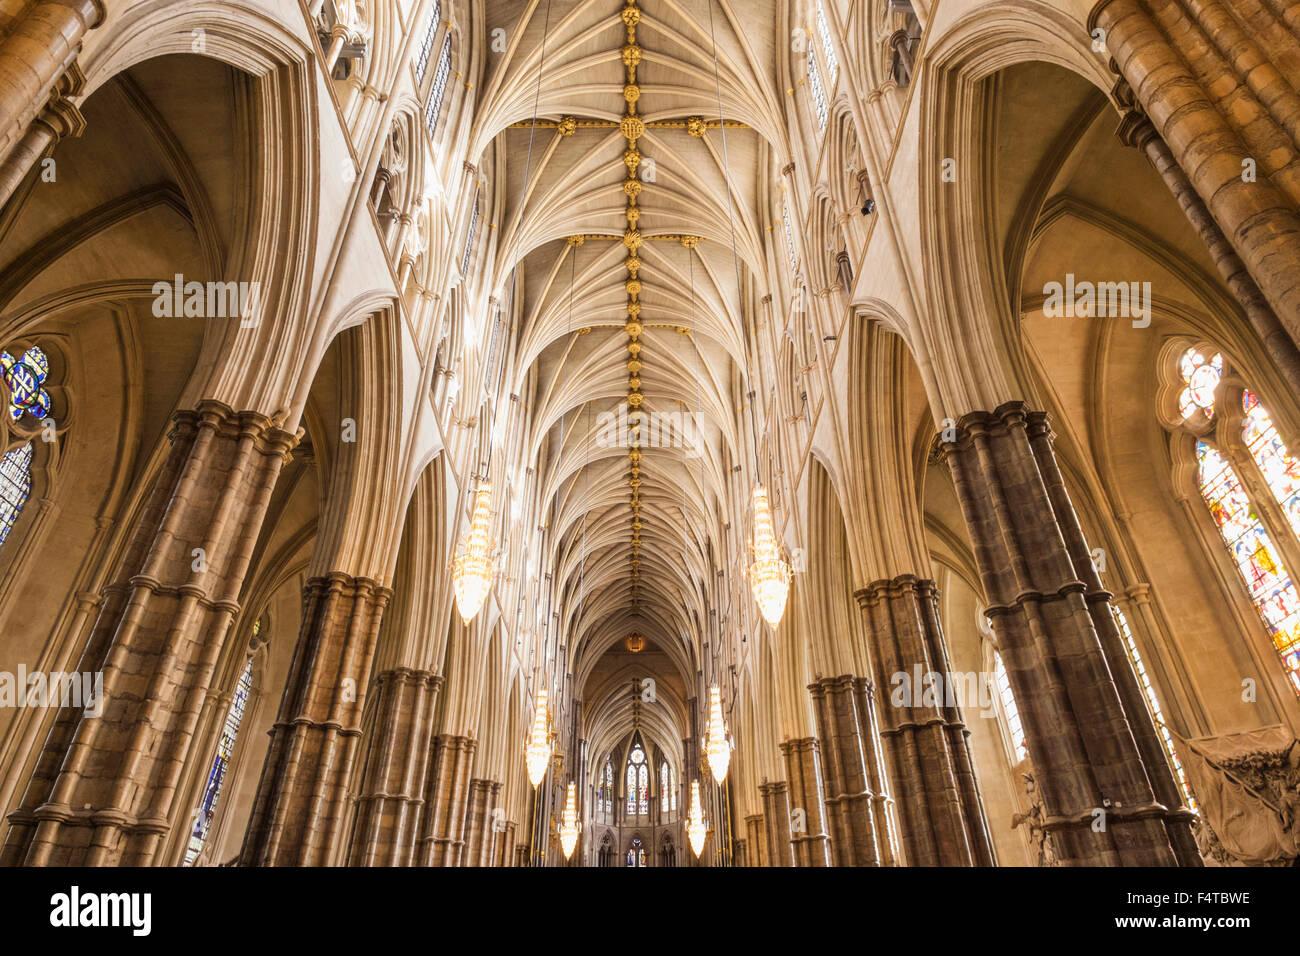 England, London, Westminster Abbey, das Kirchenschiff Stockbild